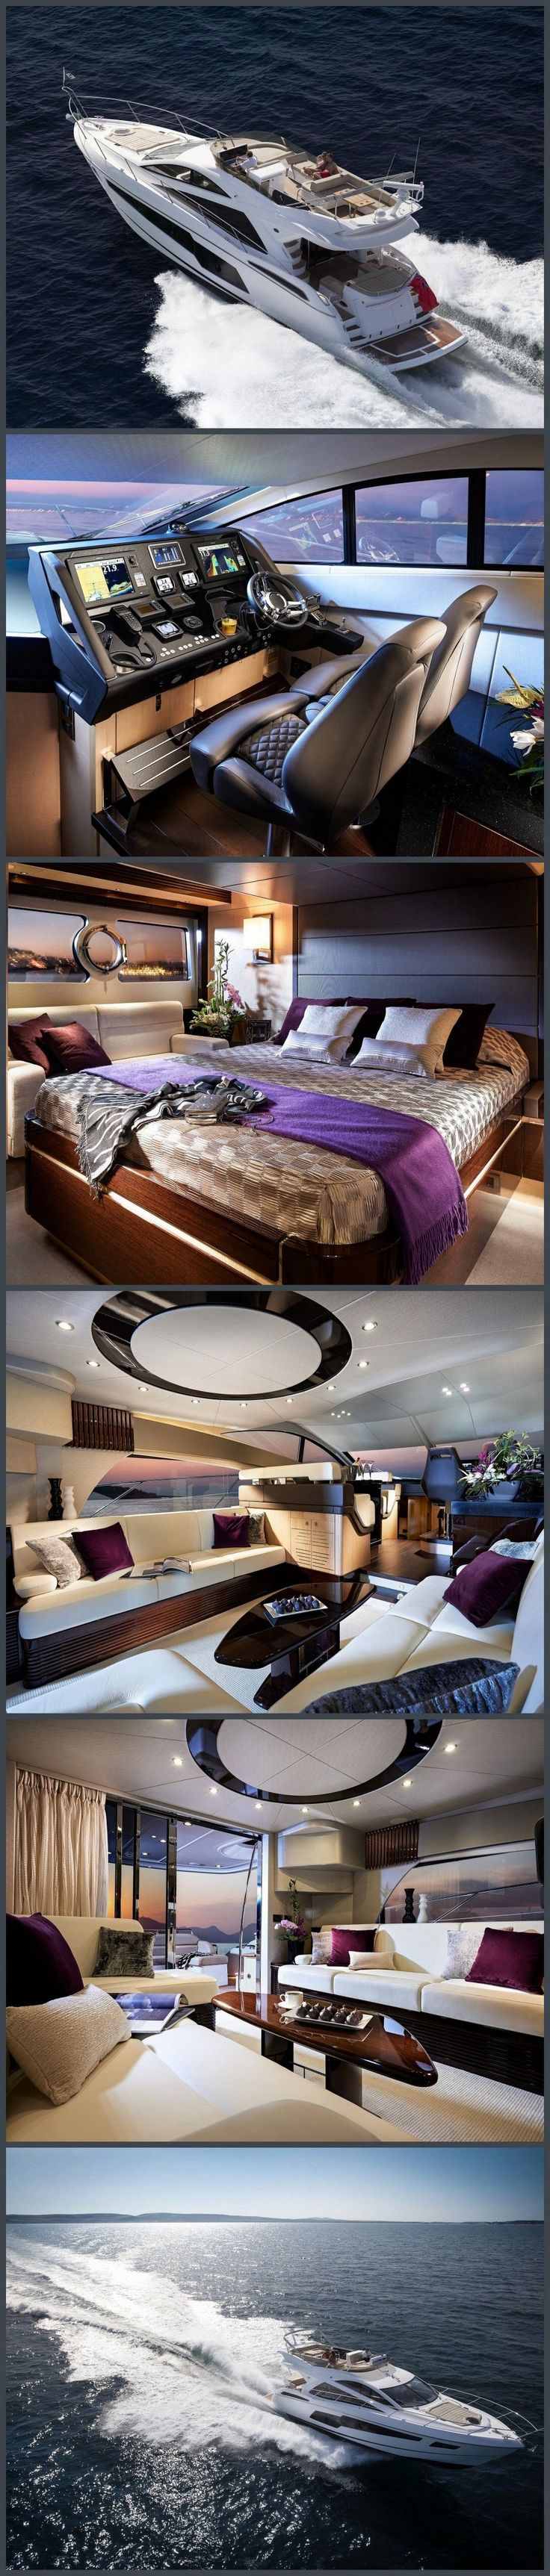 Luxury yacht interior http://www.womenswatchhouse.com/